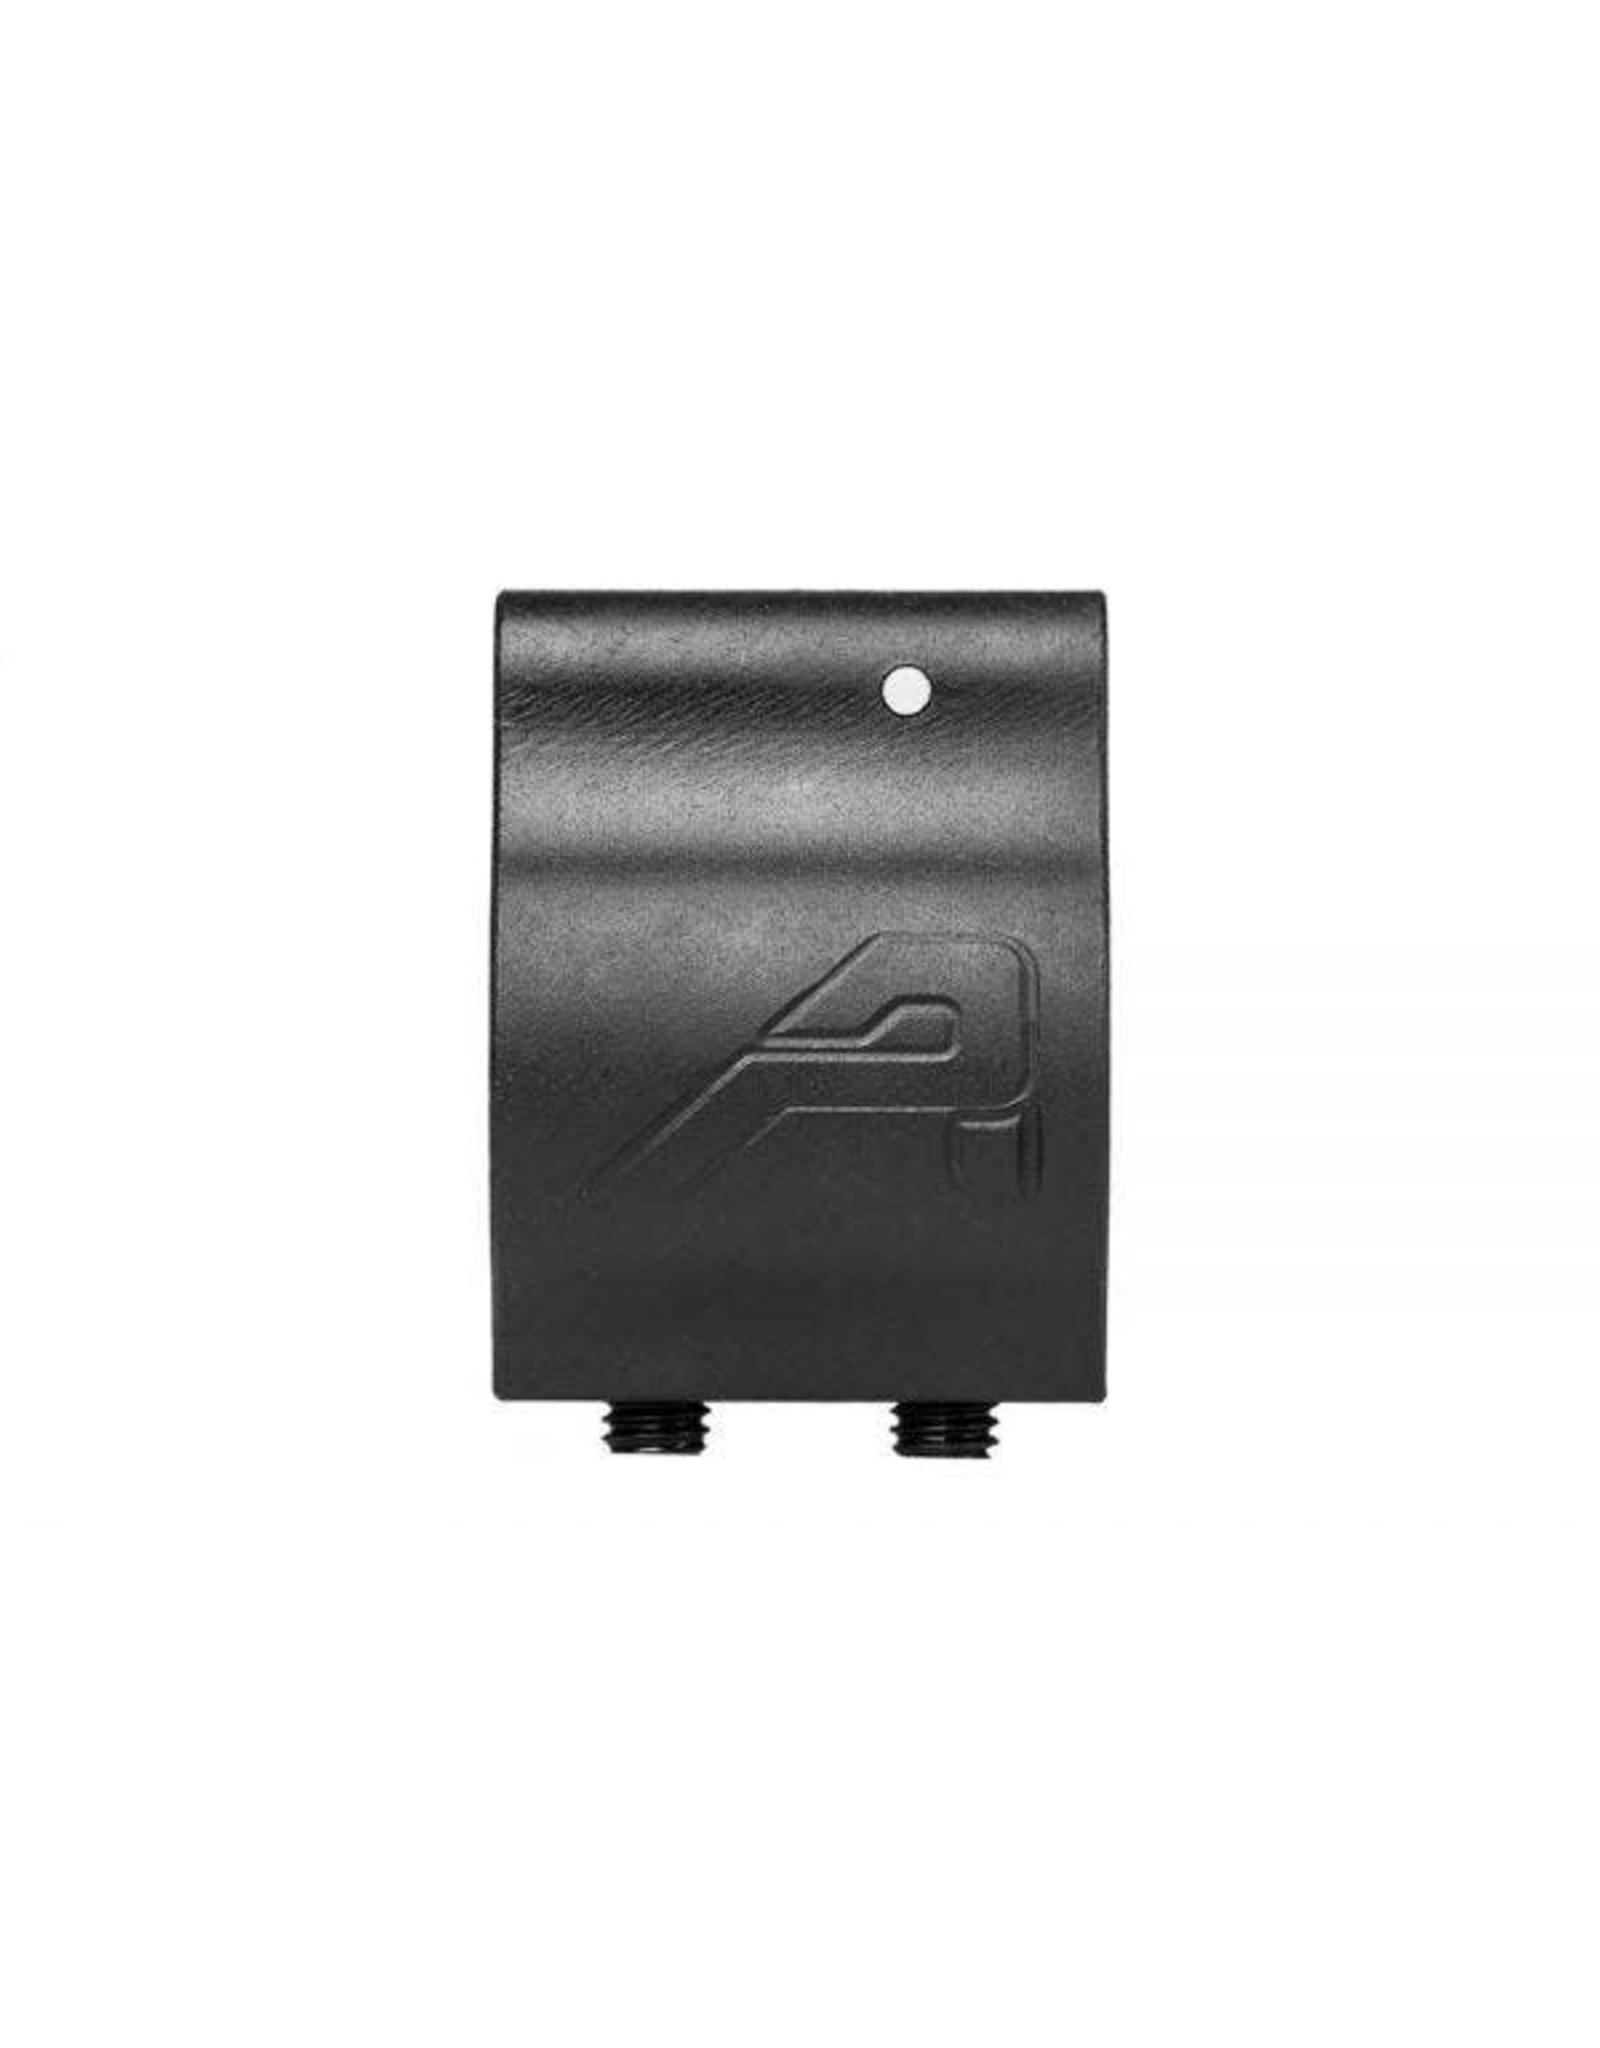 Aero Precision .750 Low Profile Gas Block - Phosphate